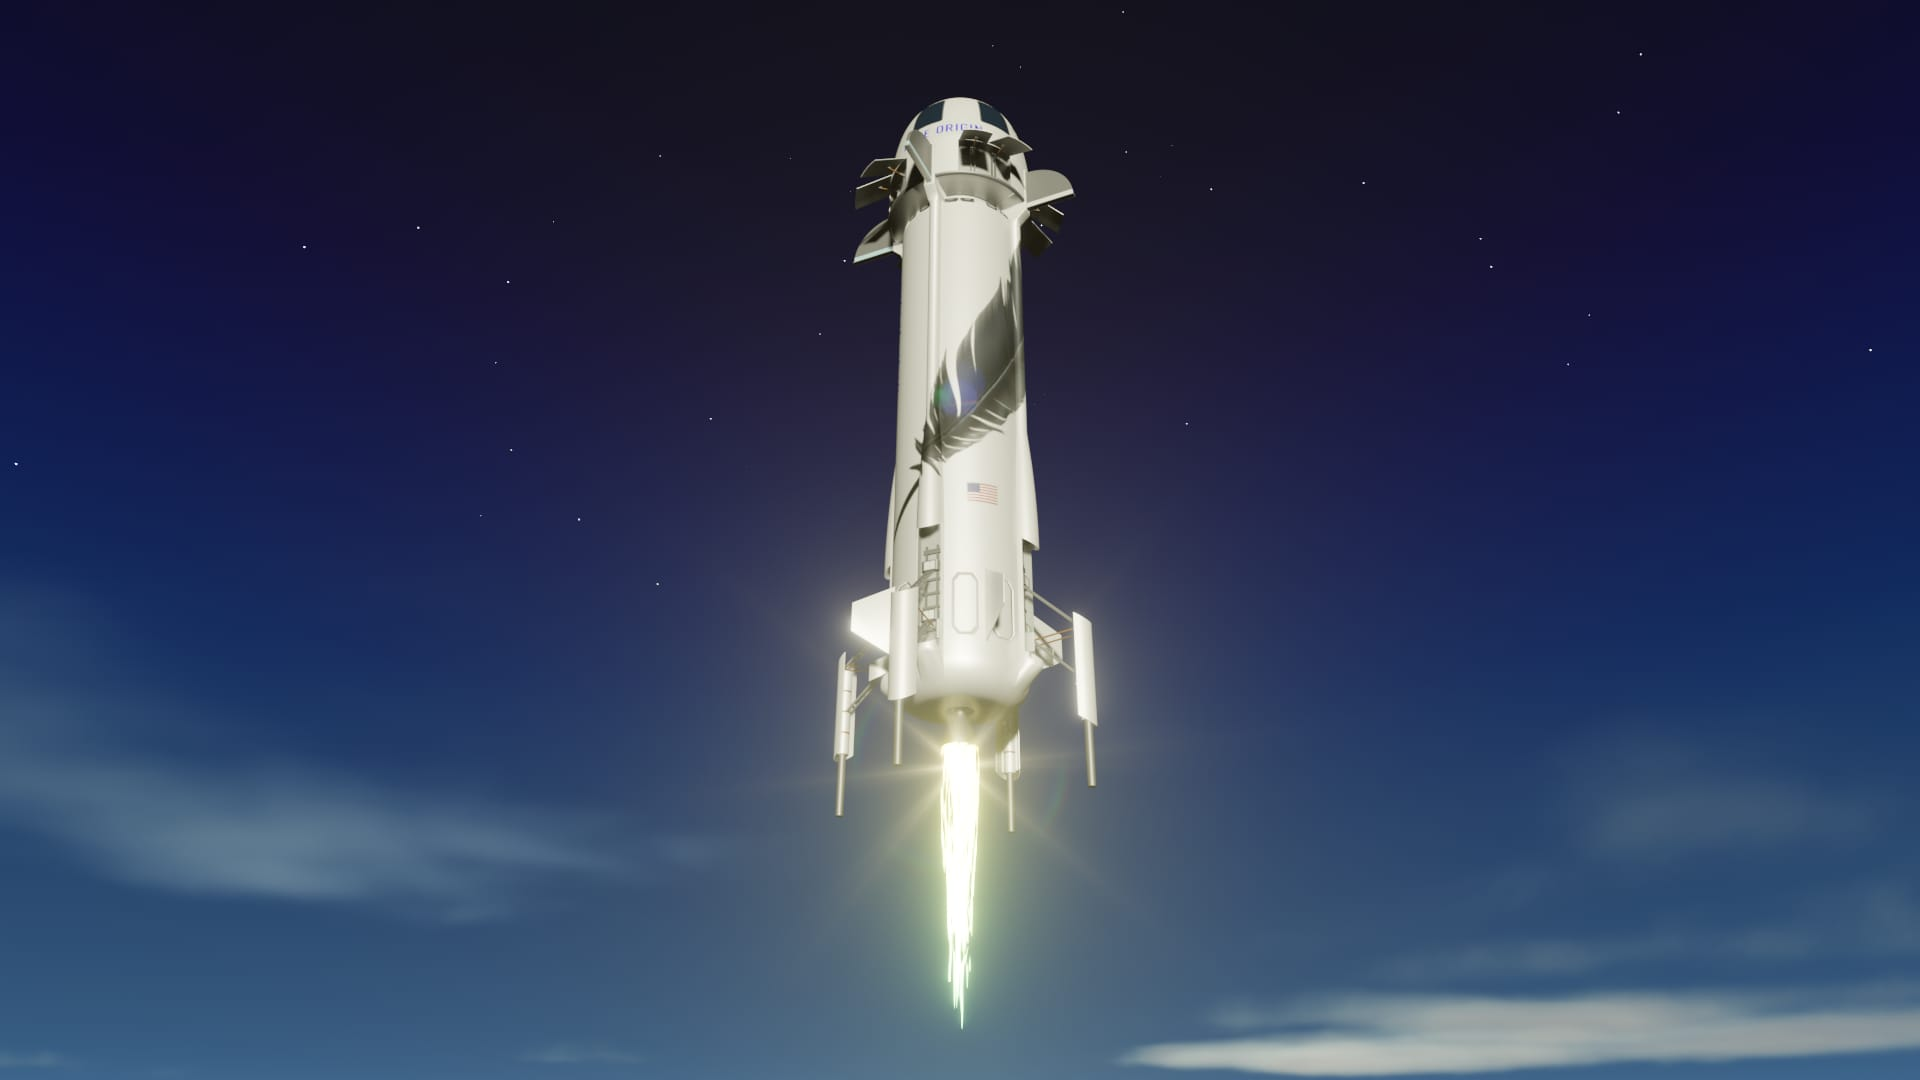 Blue Origin's First Crewed Suborbital Flight